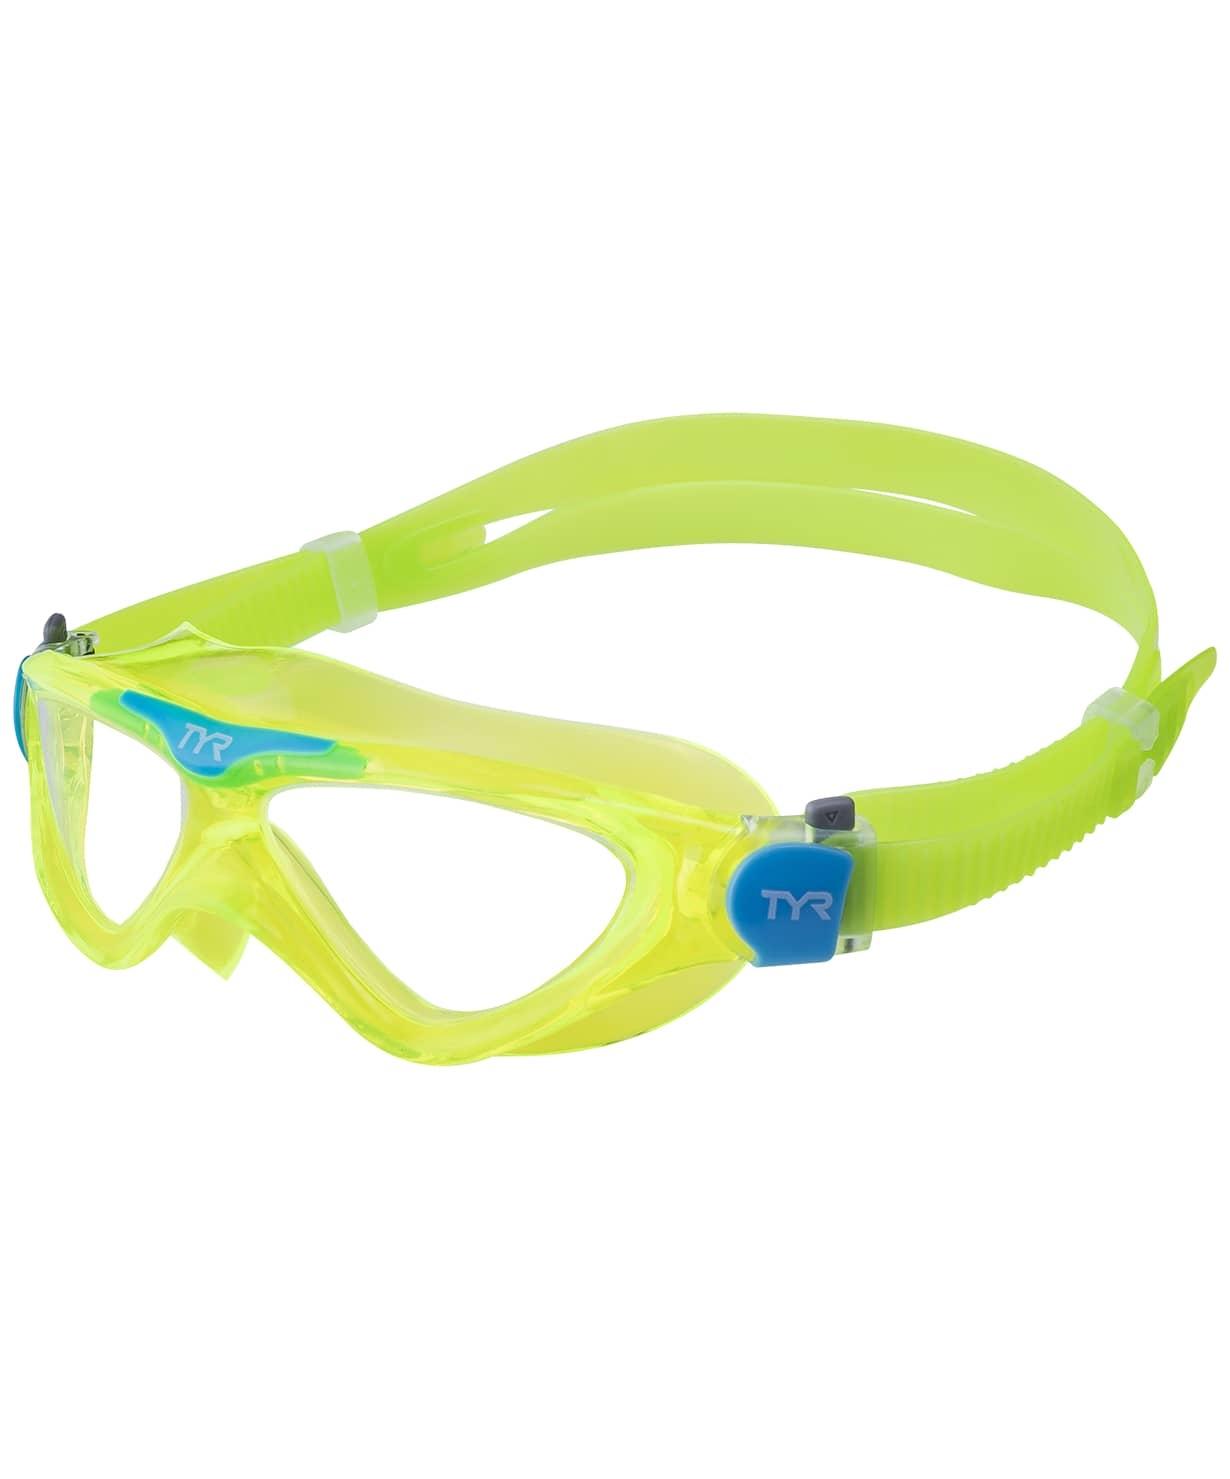 Маска для плавания Rogue Swim Mask Youth, LGRSMKD/892, зеленый